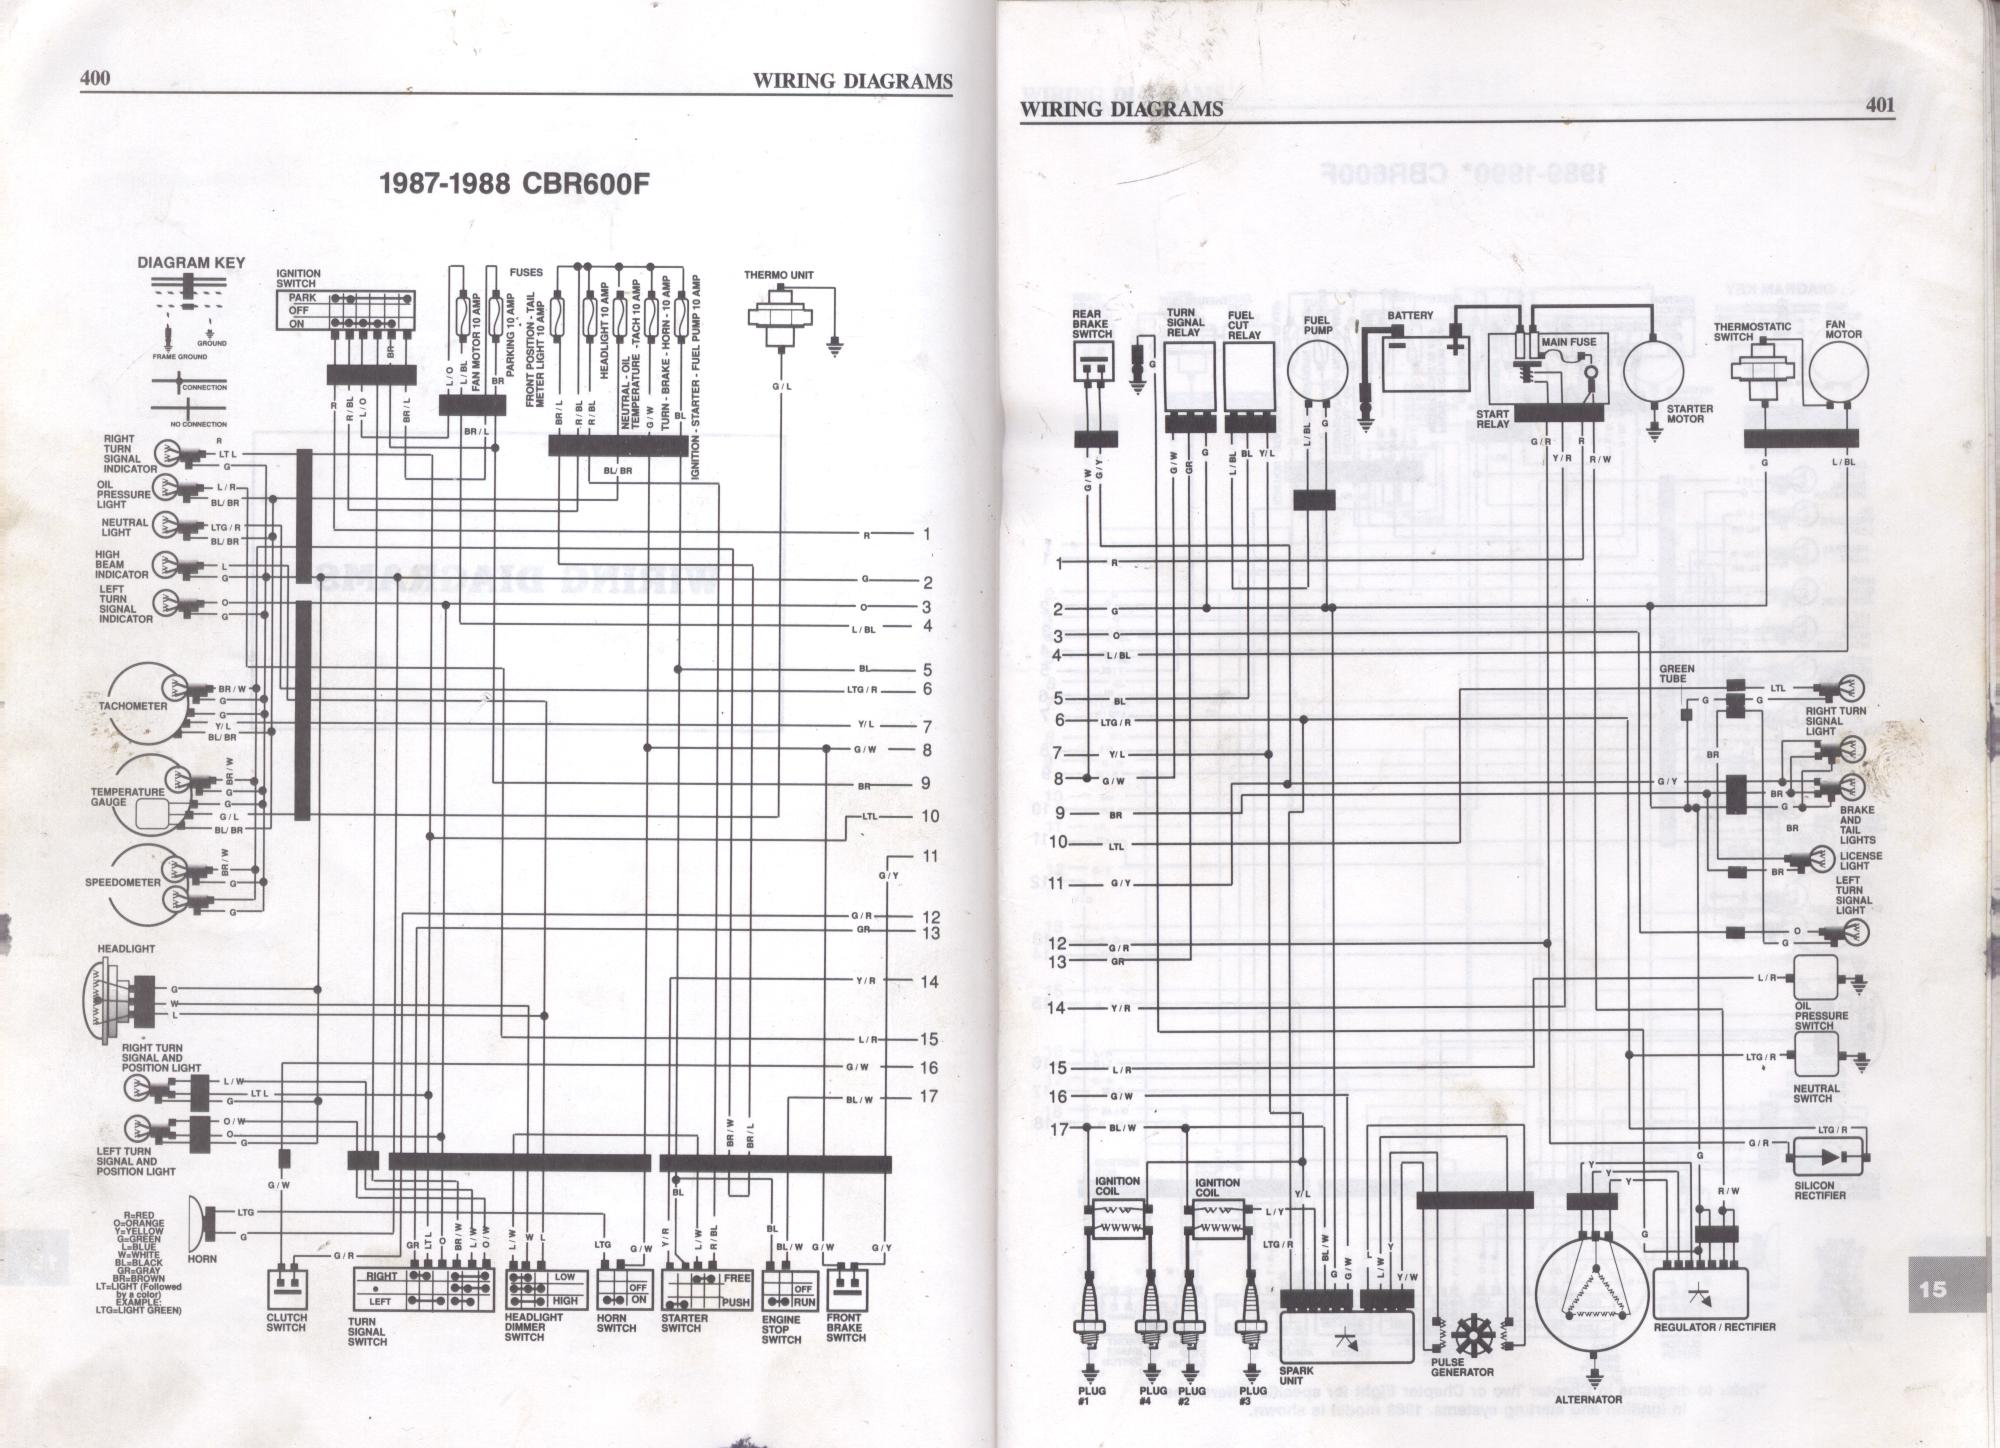 1987 1988 Honda CBR600F Wiring Diagrams?resize\\\\\\\\\\\\\\\\\\\\\\\\\\\\\\=665%2C481 100 [ 2005 2009 and 2011 2012 yamaha ttr230 service repair manual YZ450F at webbmarketing.co